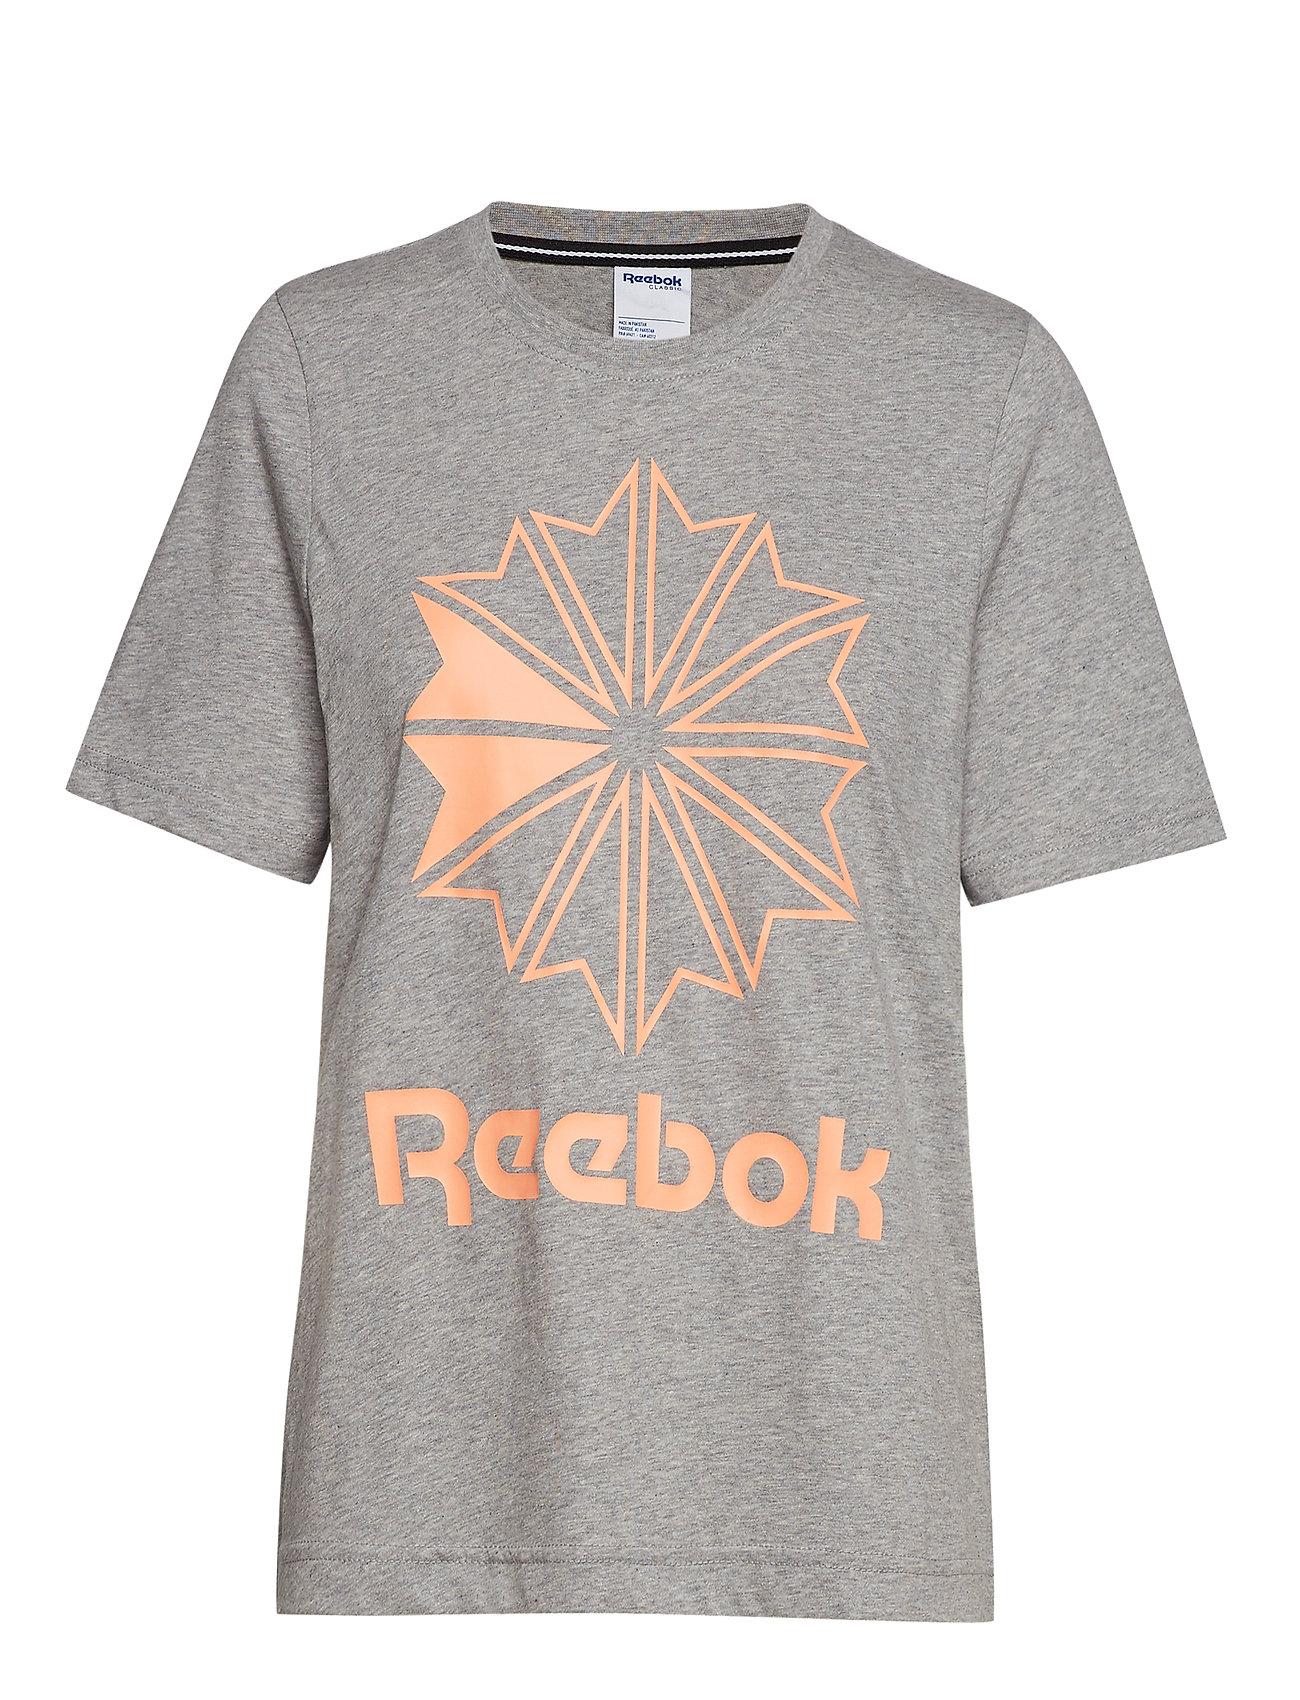 Image of Ac Gr Tee T-shirt Top Grå Reebok Classics (3207951755)